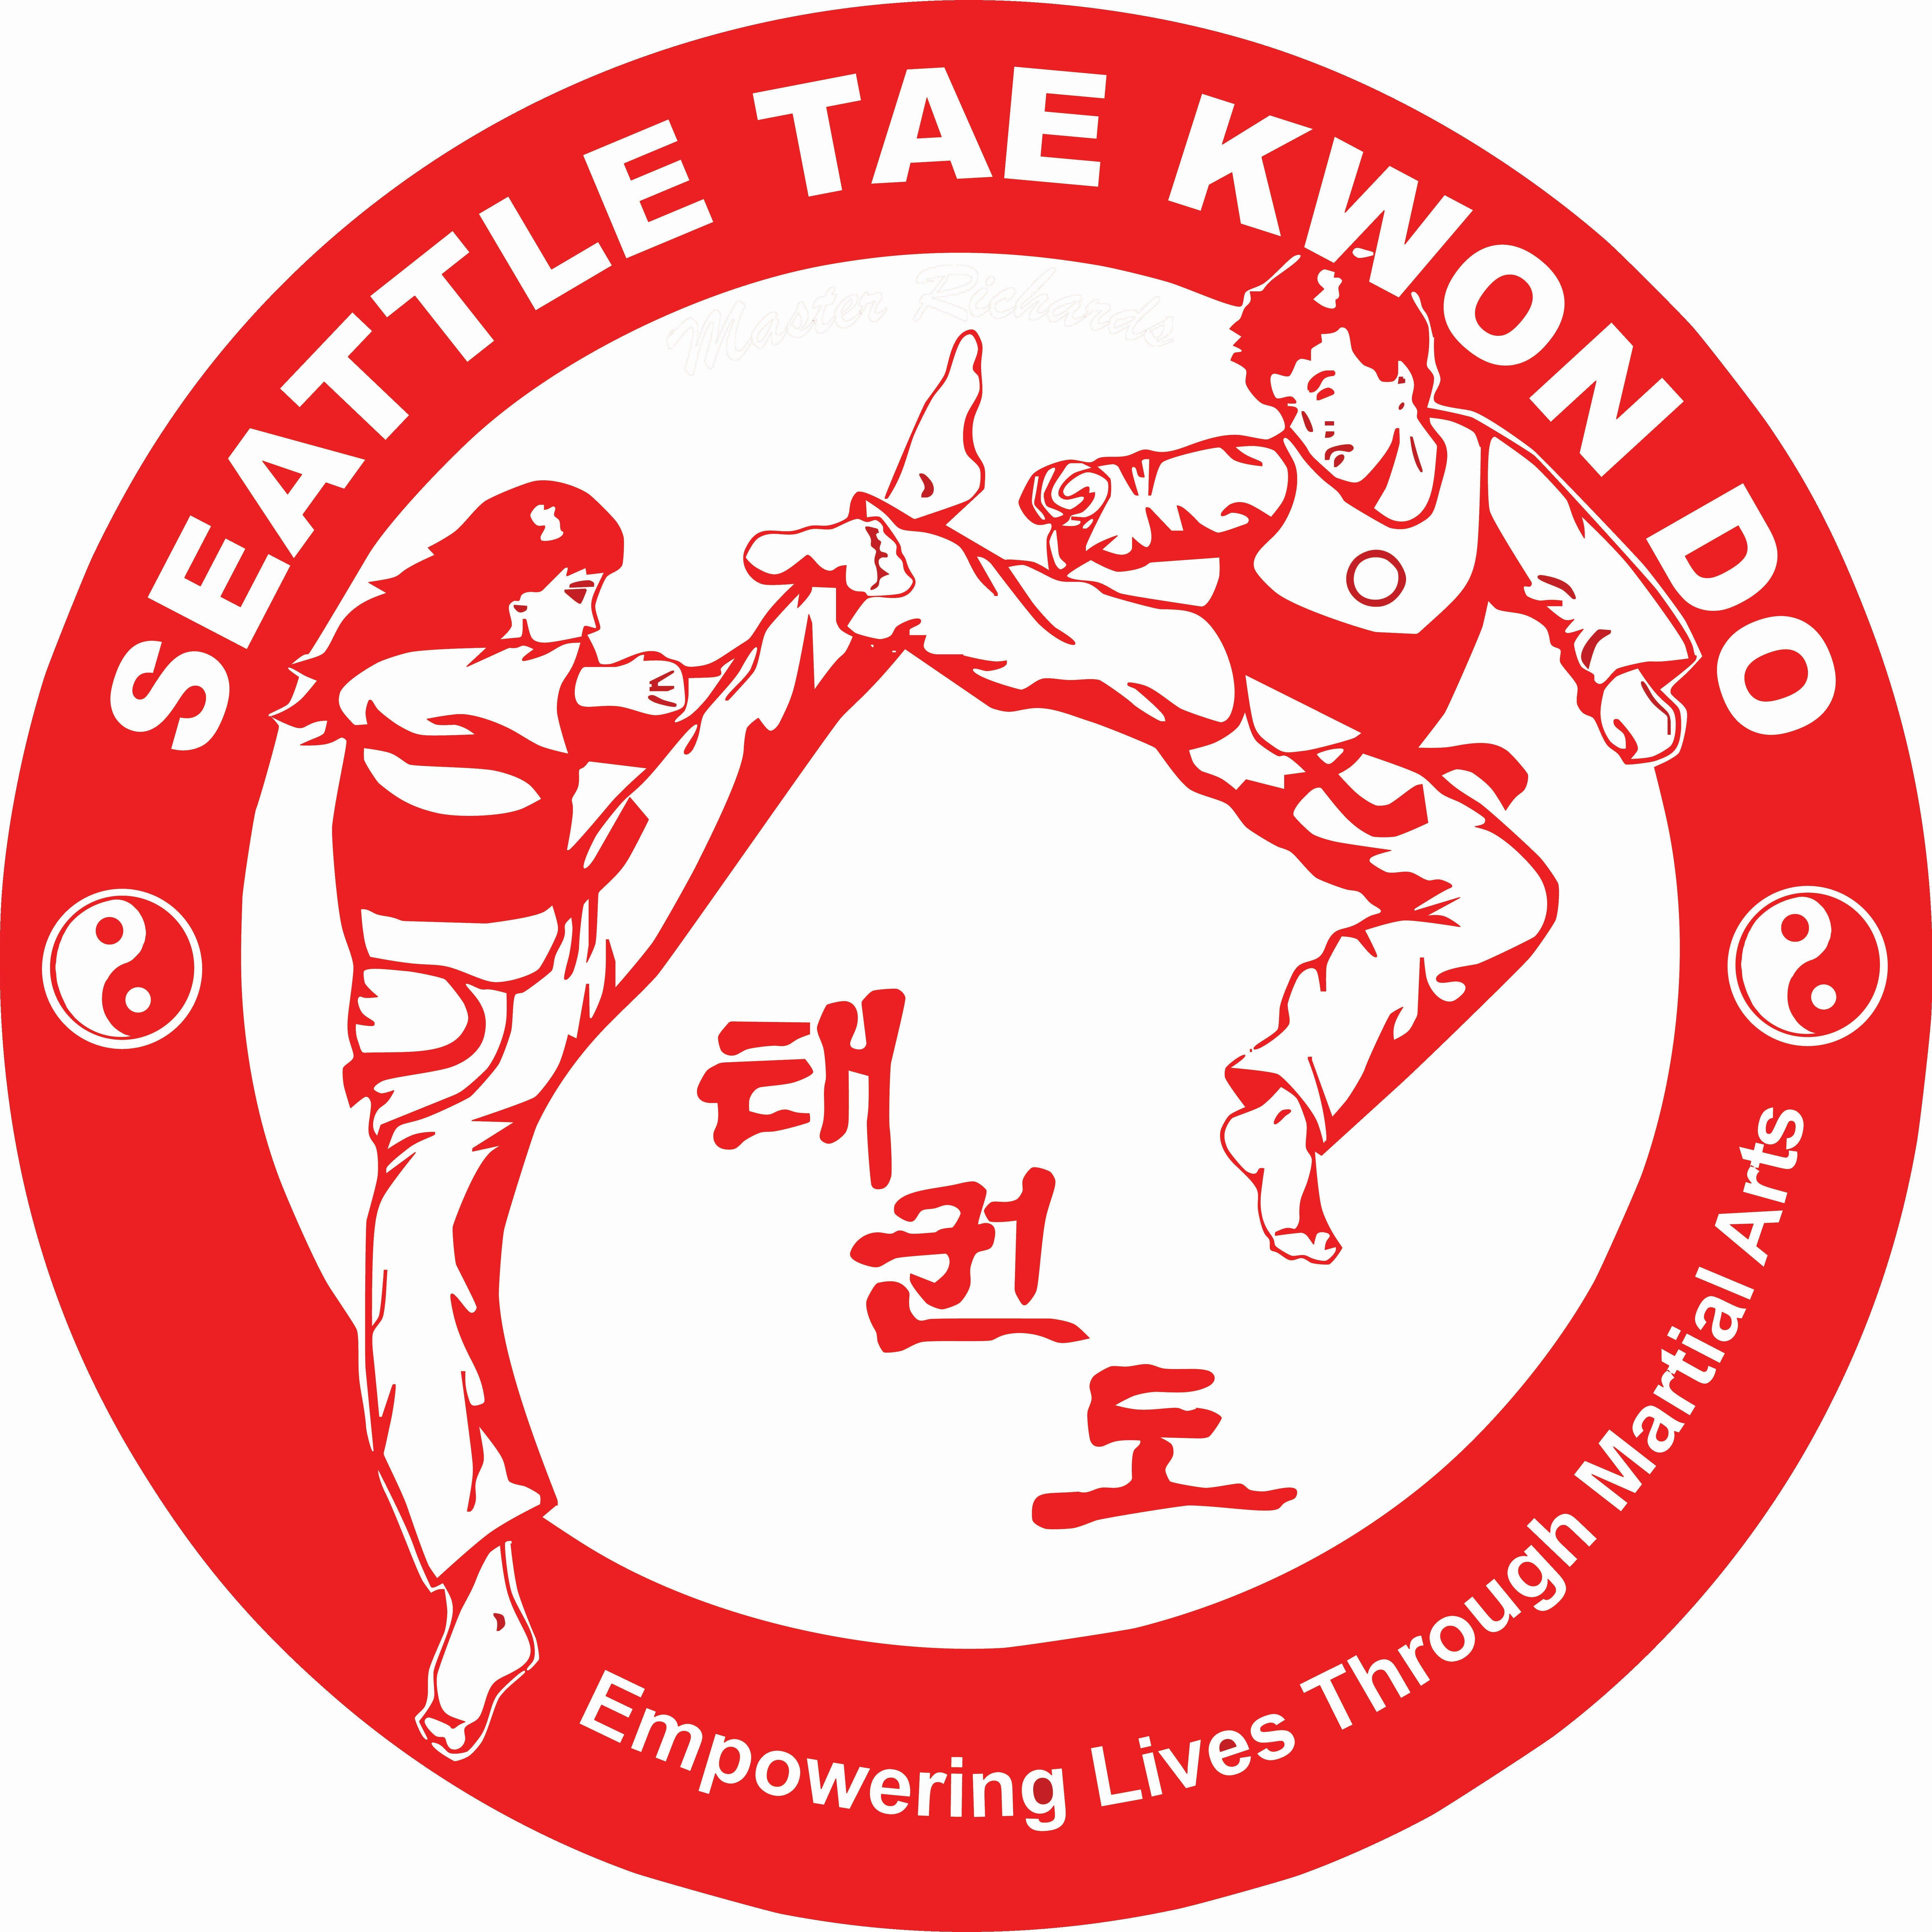 Seattle Tae Kwon Do of Mountlake Terrace - Mountlake Terrace, WA - Martial Arts Instruction